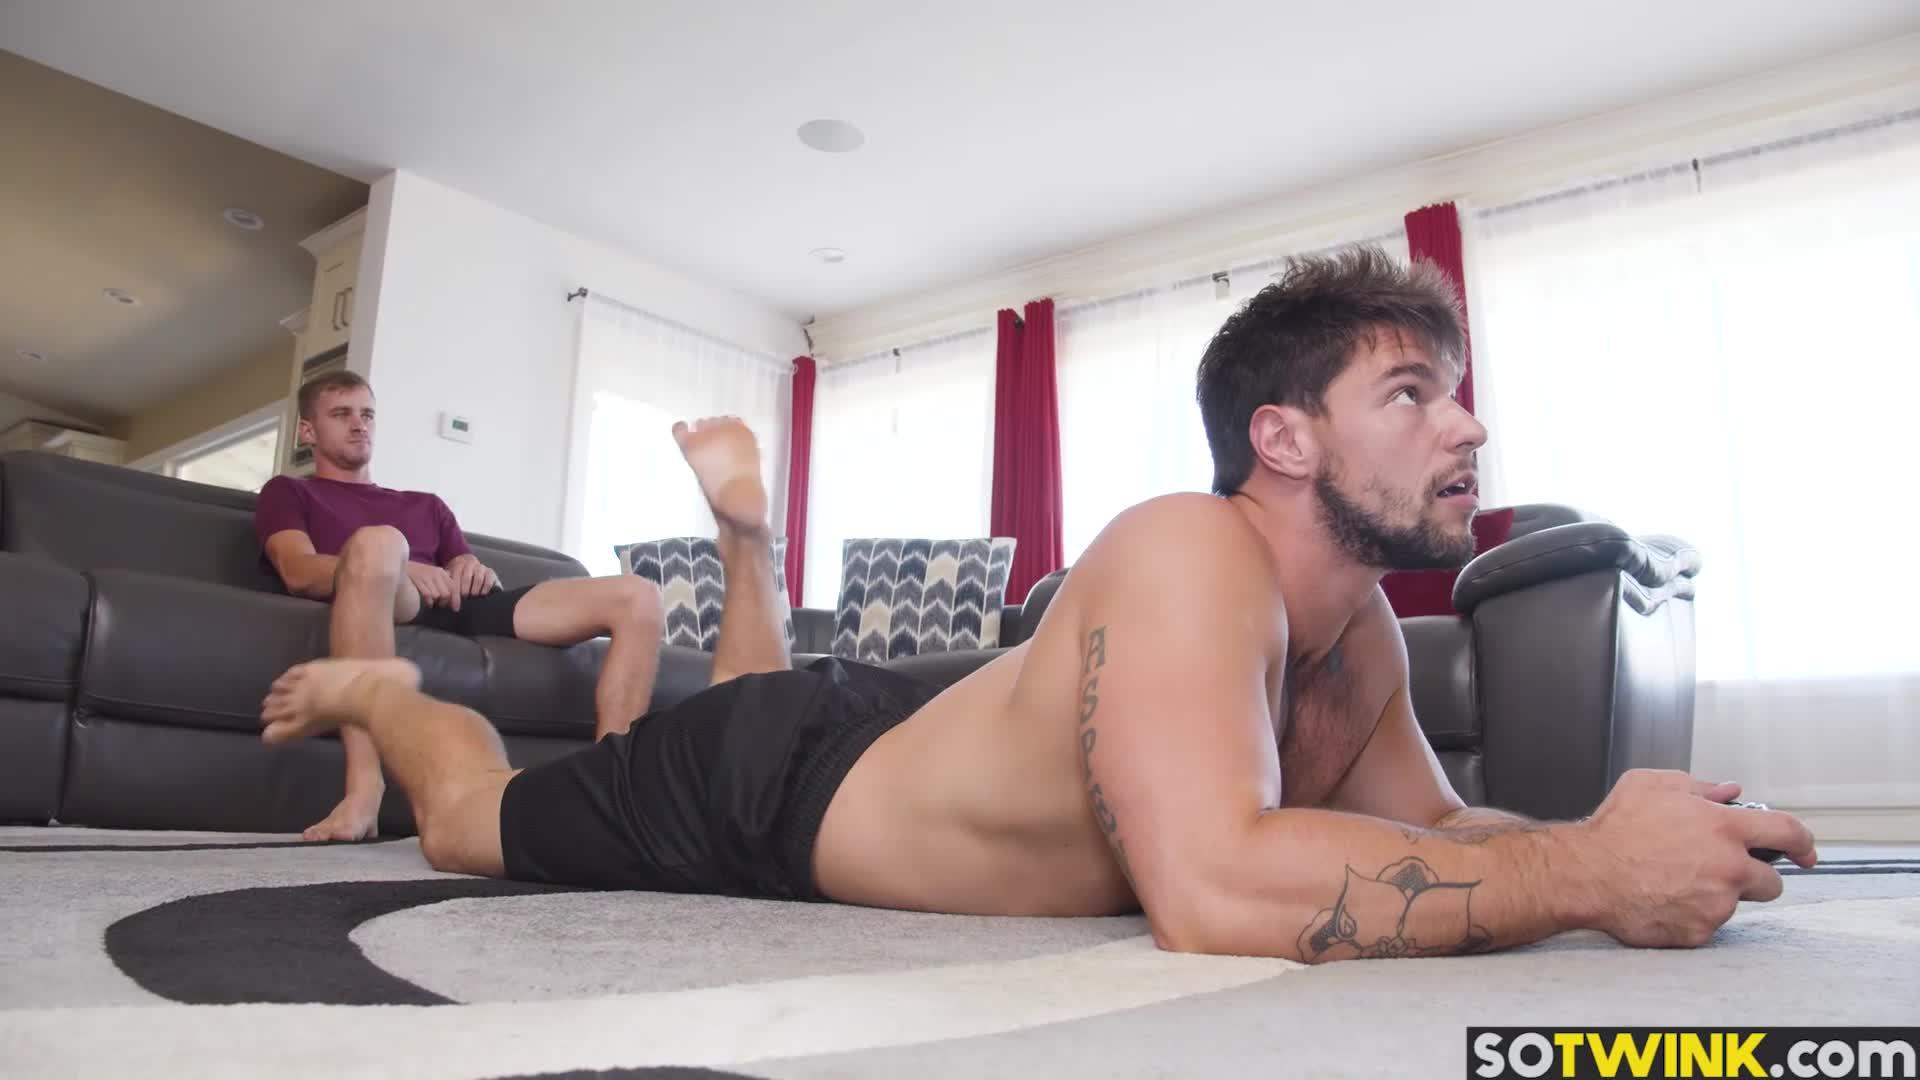 Alex Blake Joystick Porn hunk inserts his big joystick inside stepbros asshole